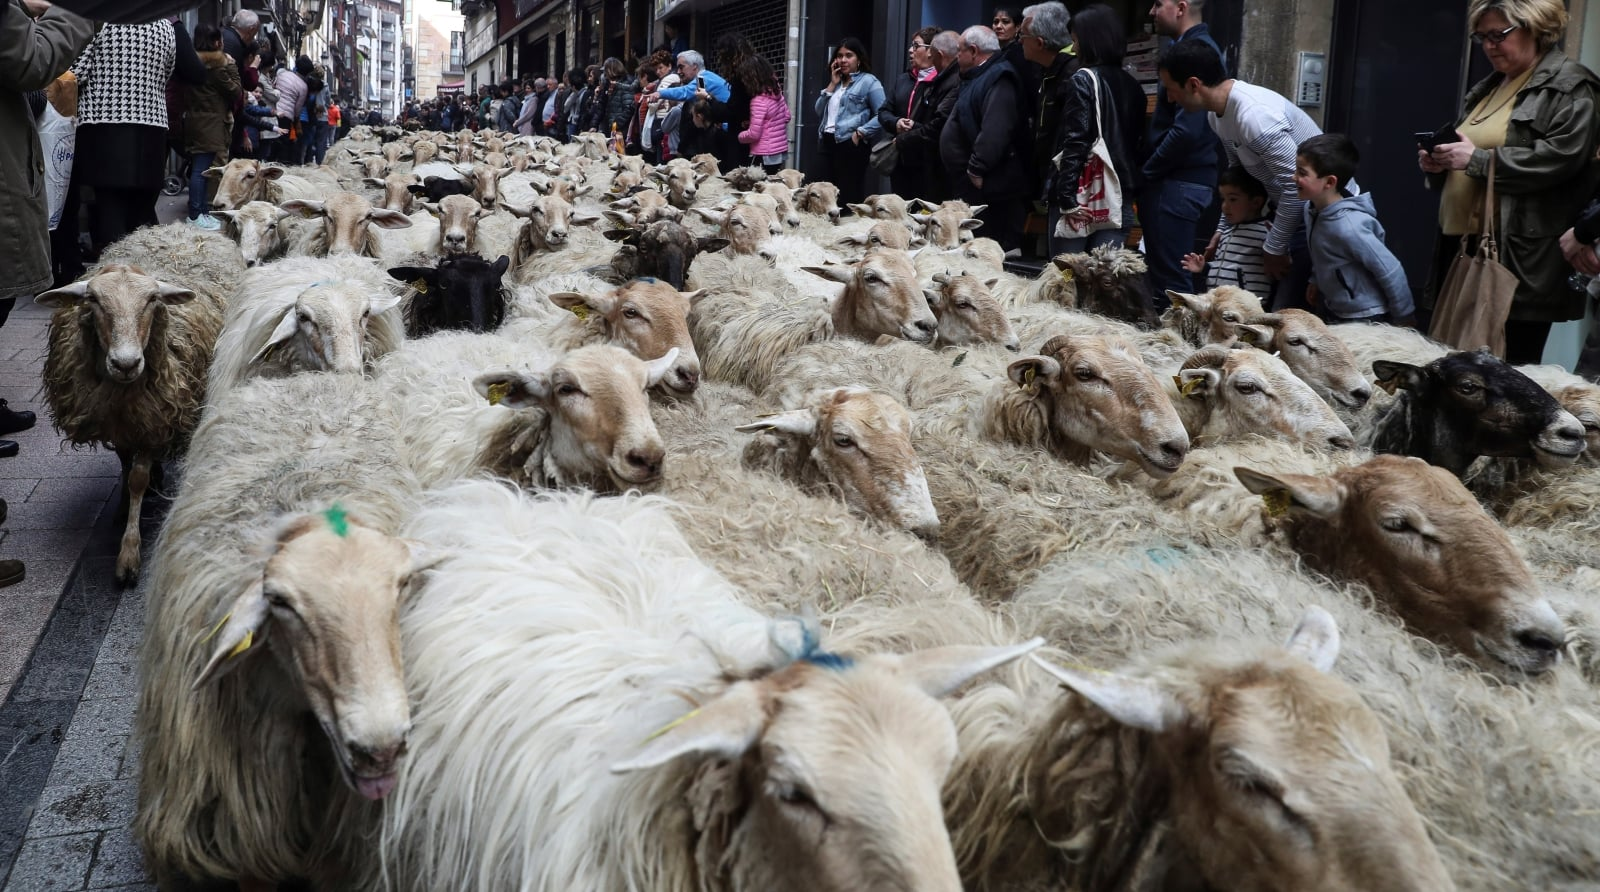 Festiwal w Kraju Basków fot. EPA/JAVIER ETXEZARRETA